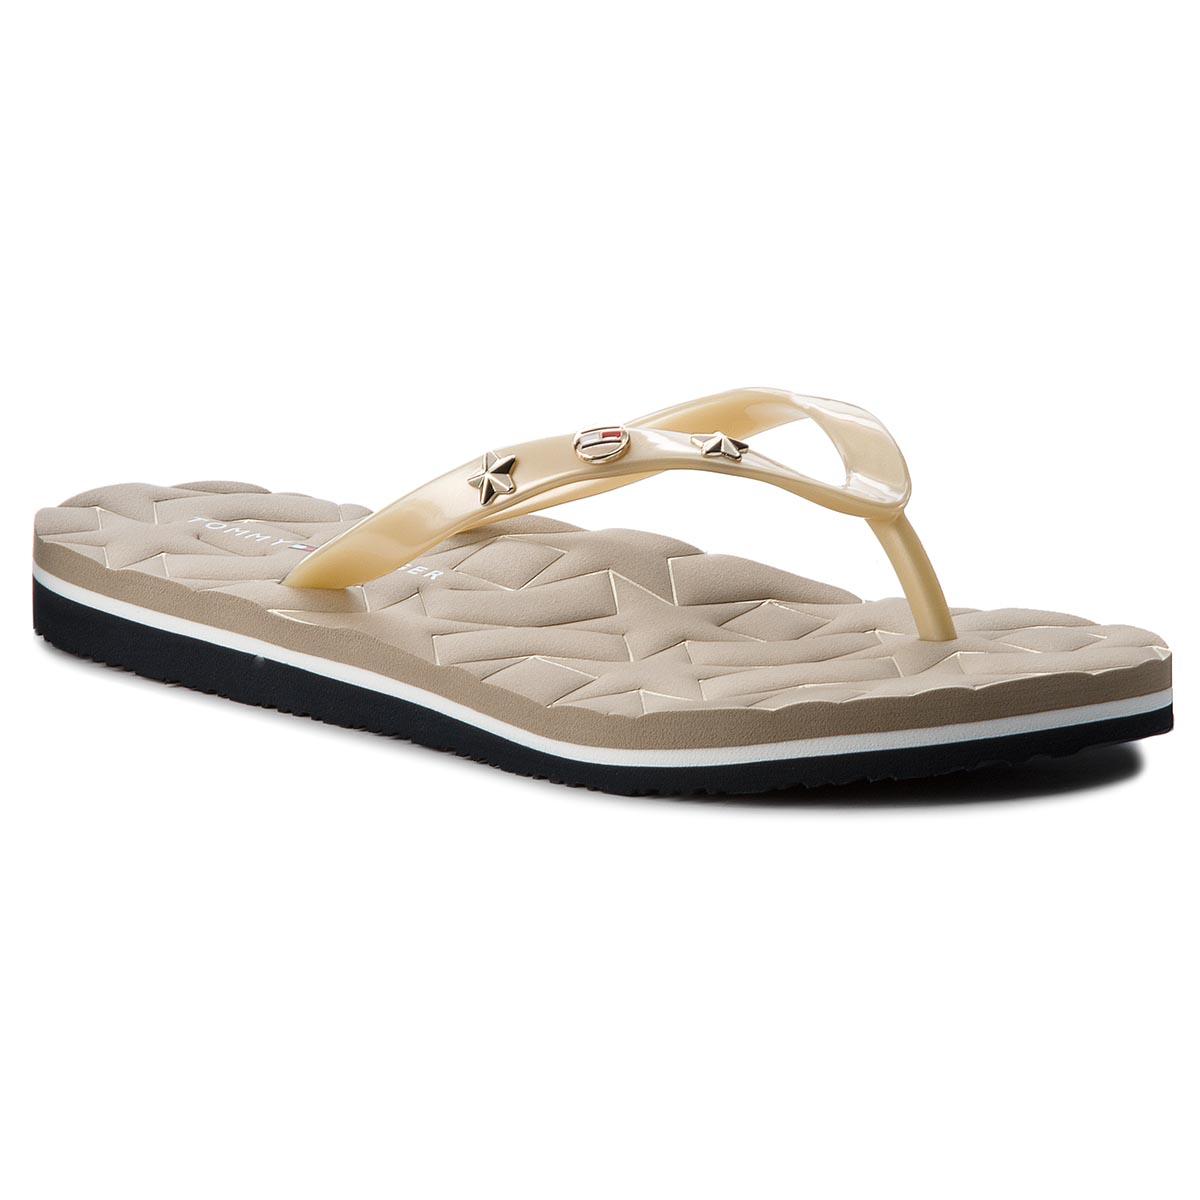 Žabky TOMMY HILFIGER - Metallic Star Beach Sandal FW0FW02656 Light ... 0eaad711dc9